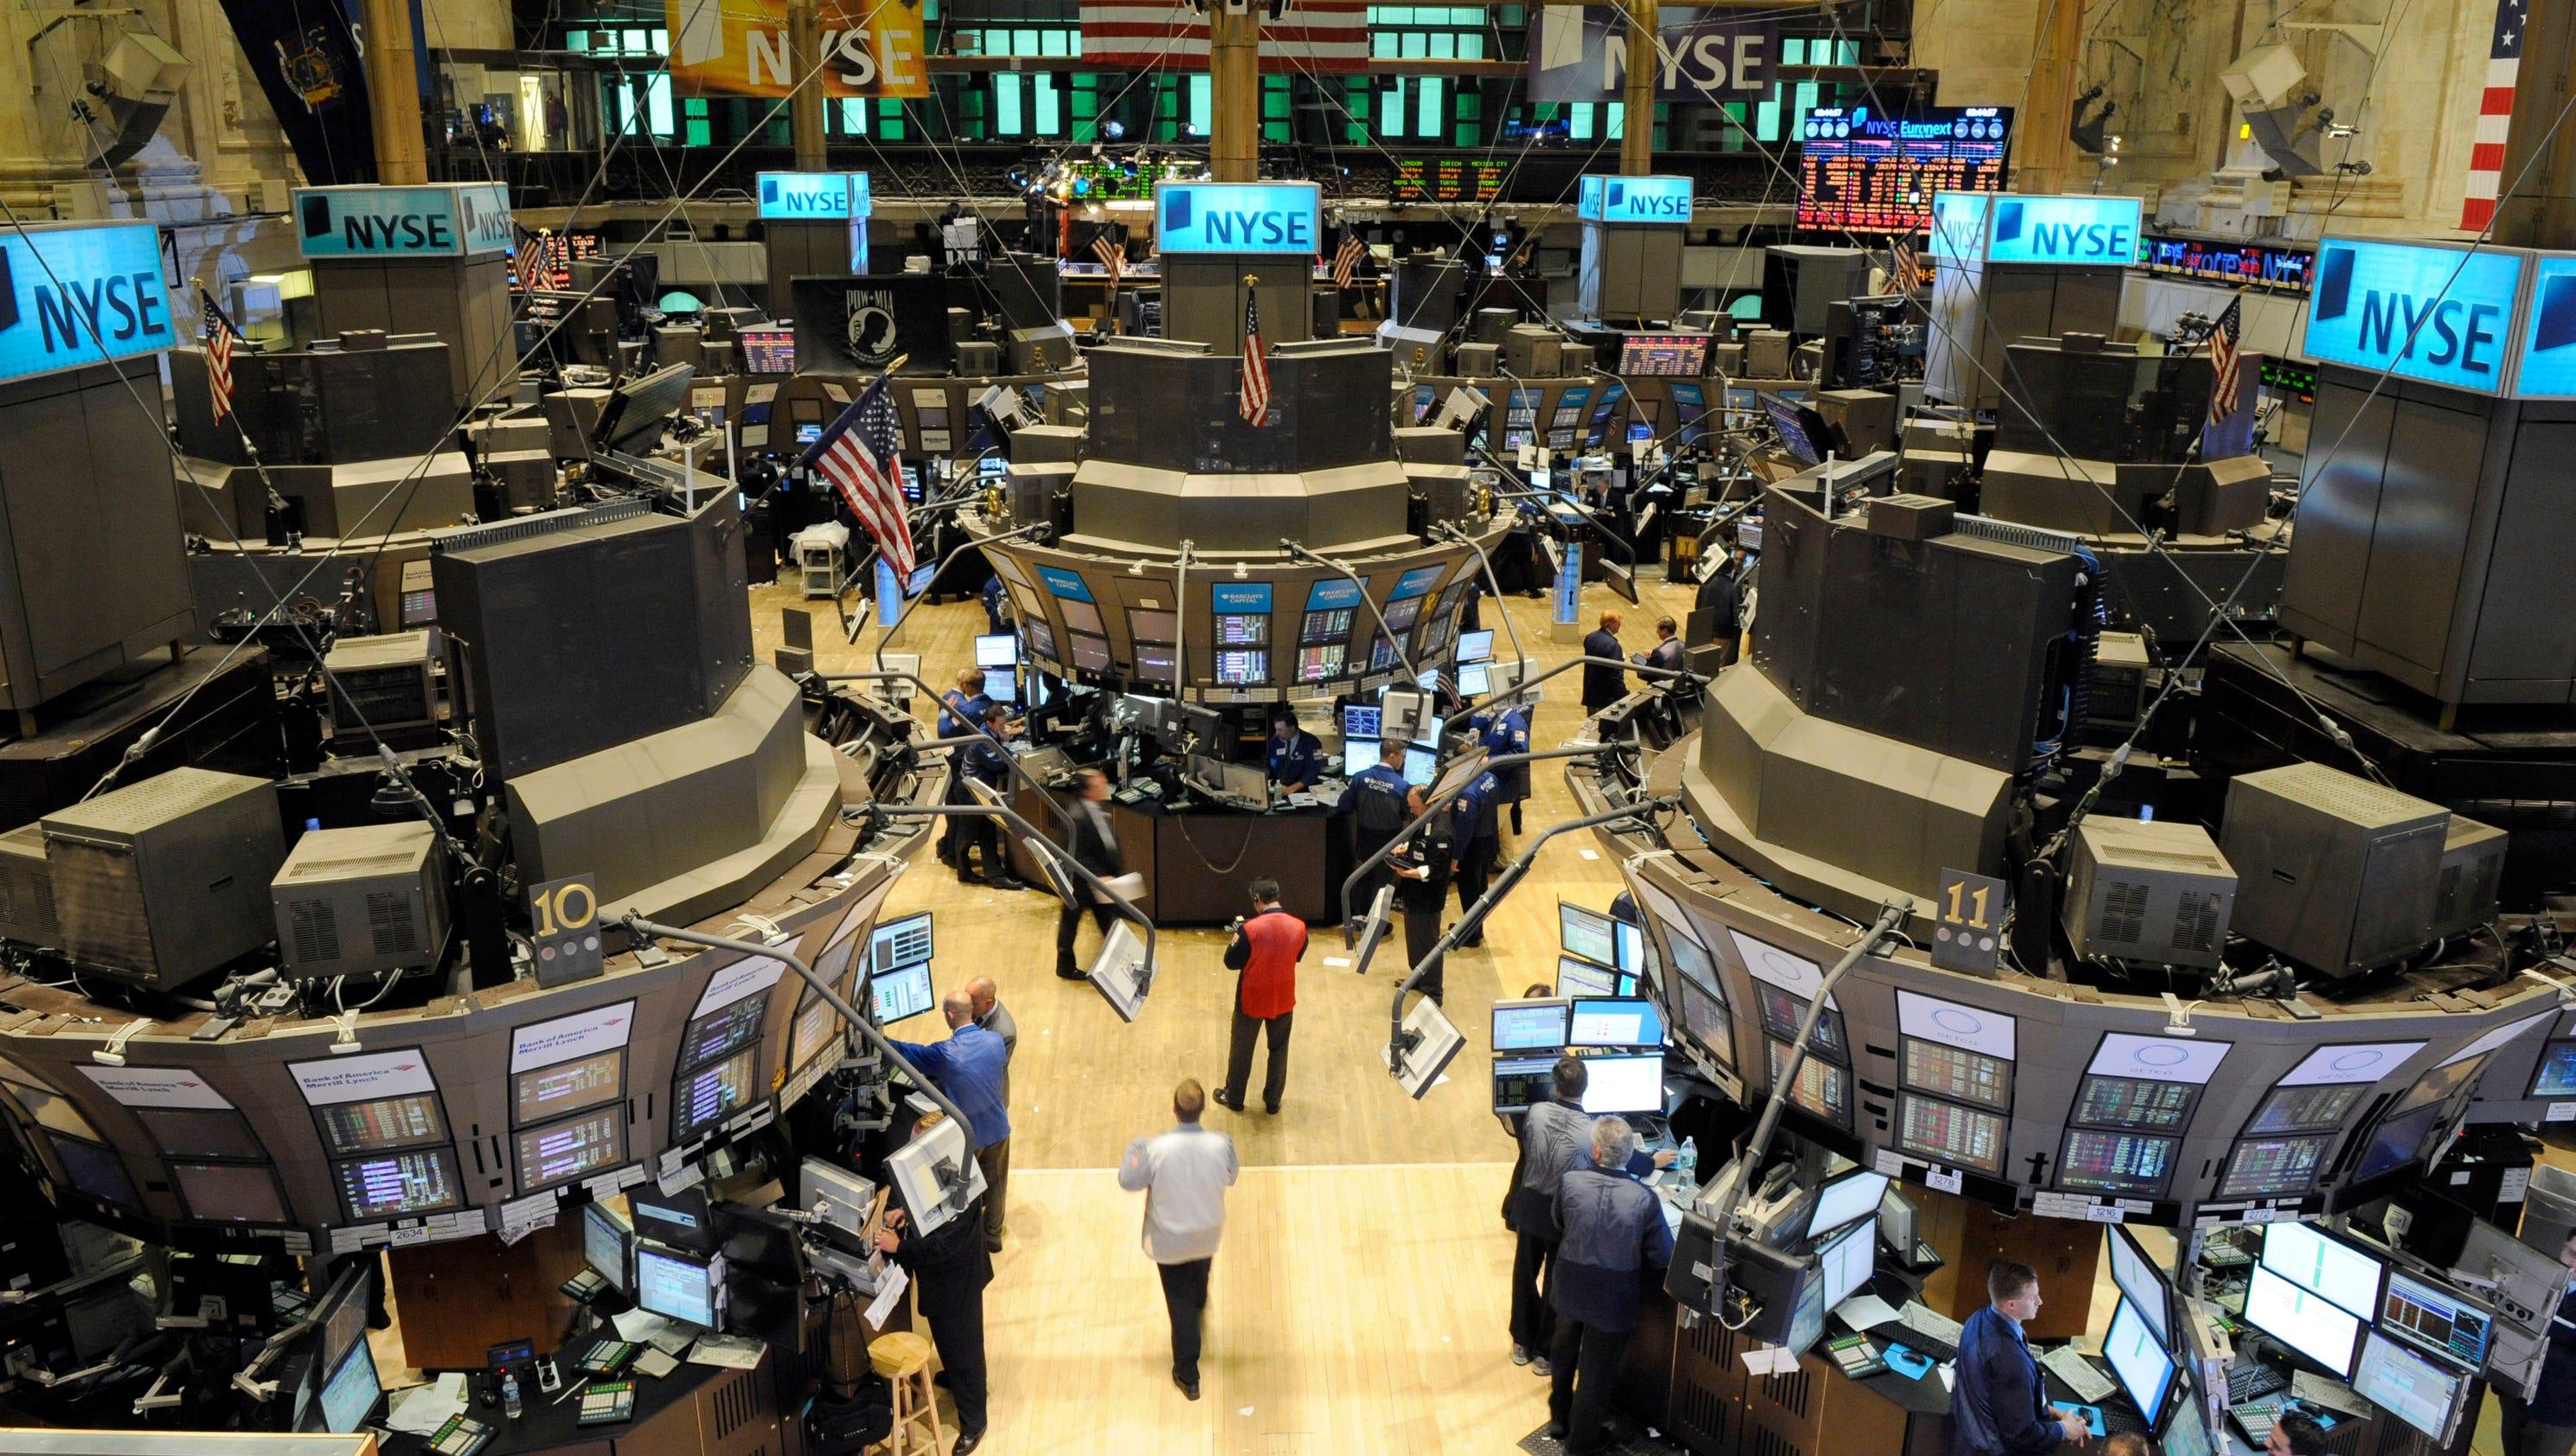 Energy / Trading / Commodities